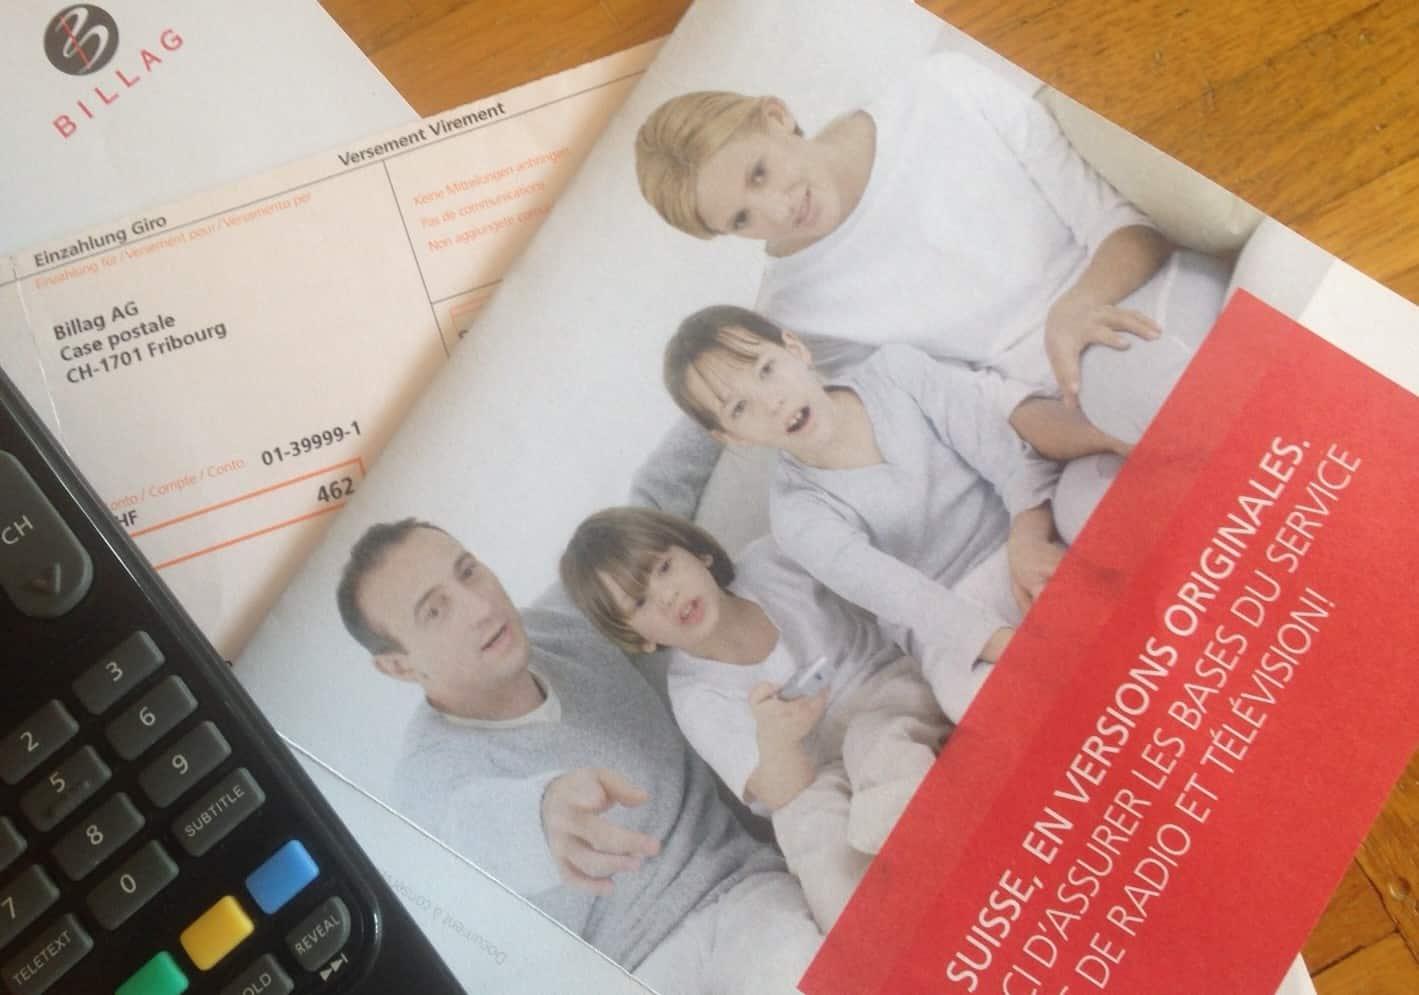 TV licence bill in Switzerland